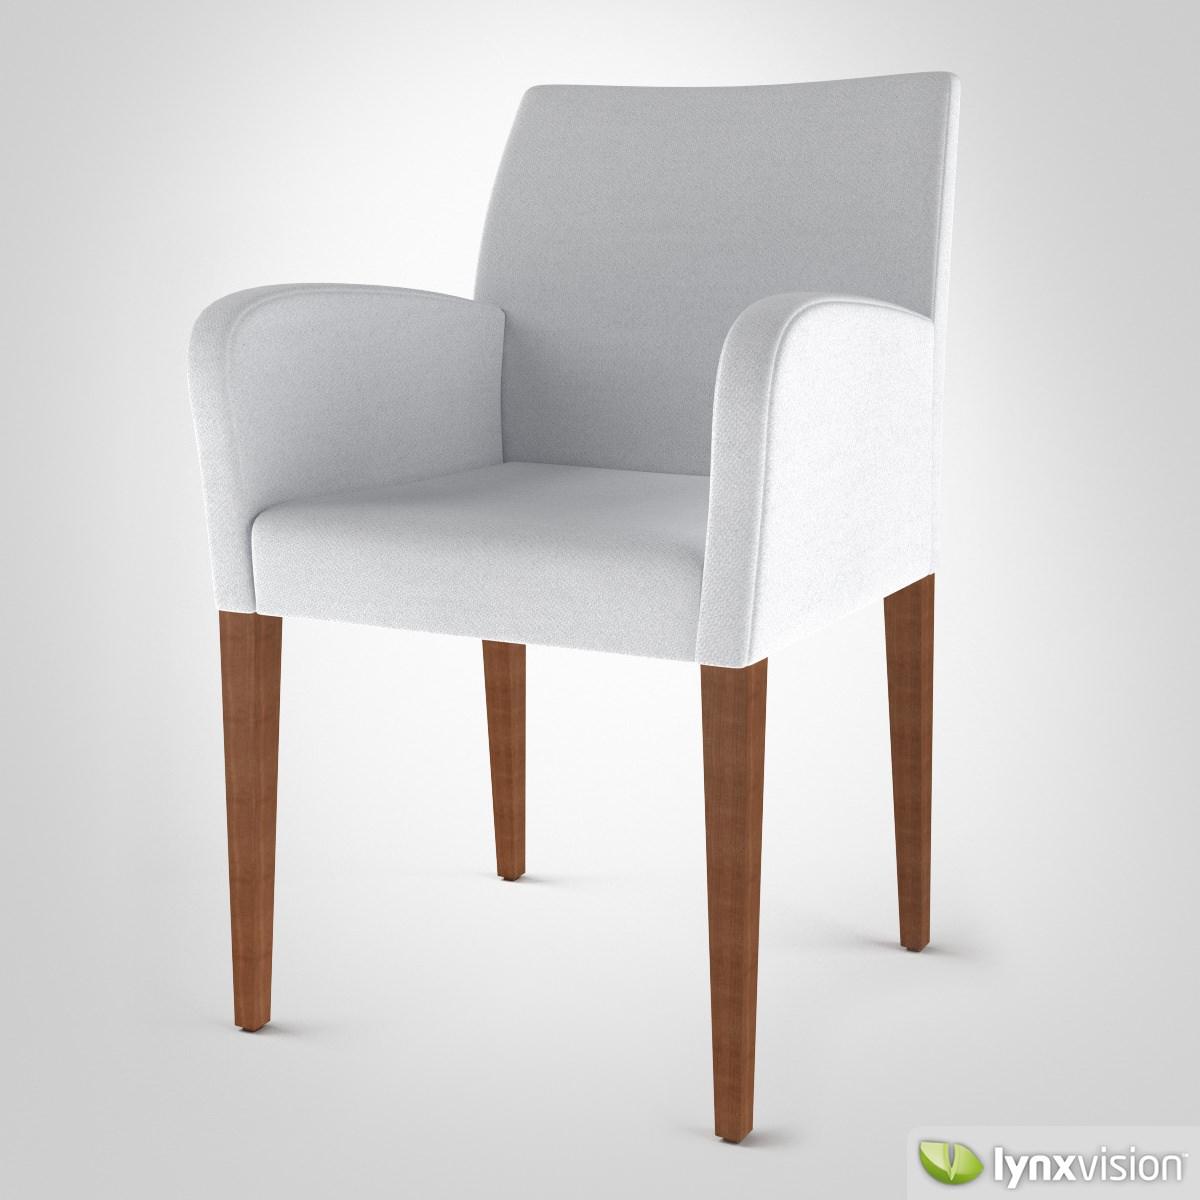 Liz chair by poltrona frau 3d model max obj fbx for Poltrona 3d